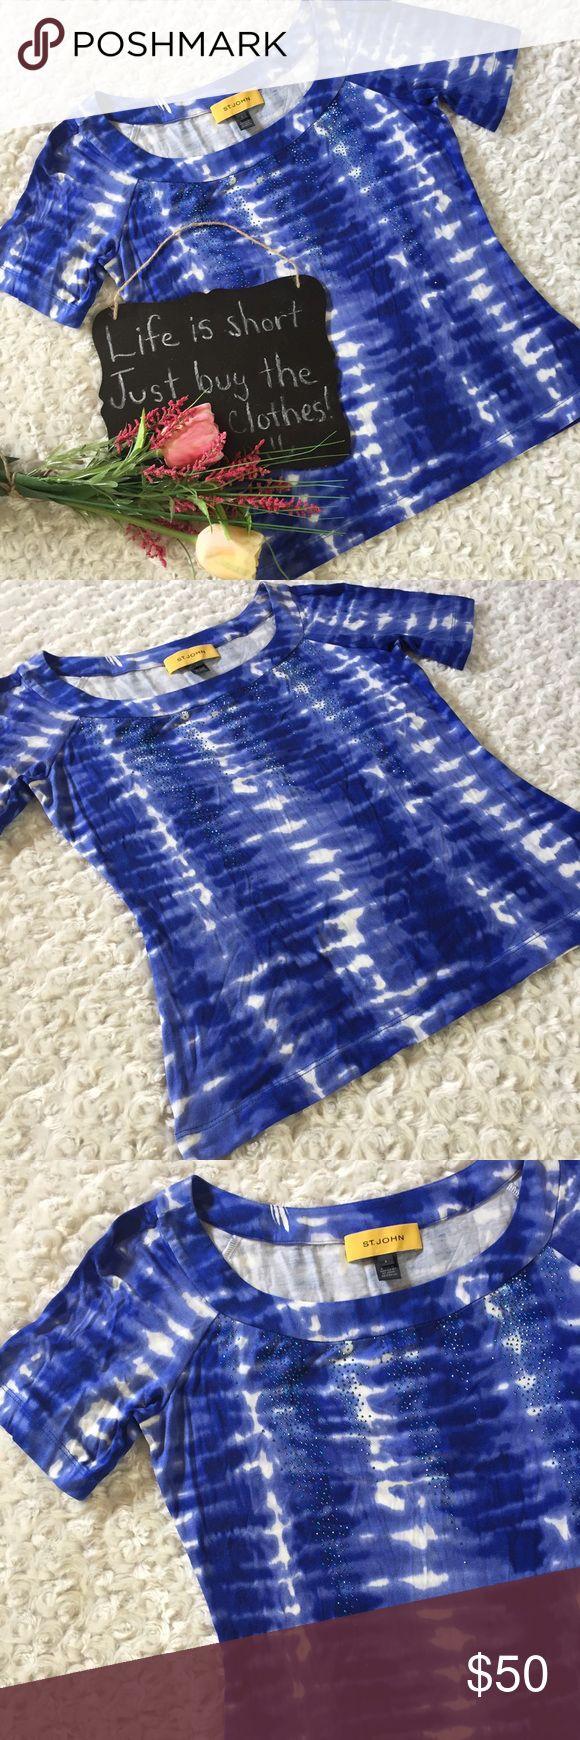 "St John blue tie dyed short sleeve top St John blue and white tie dyed top. Short Sleeve and very soft. Size S. 17"" arm pit to arm pit. 22.5"" length. St. John Tops"